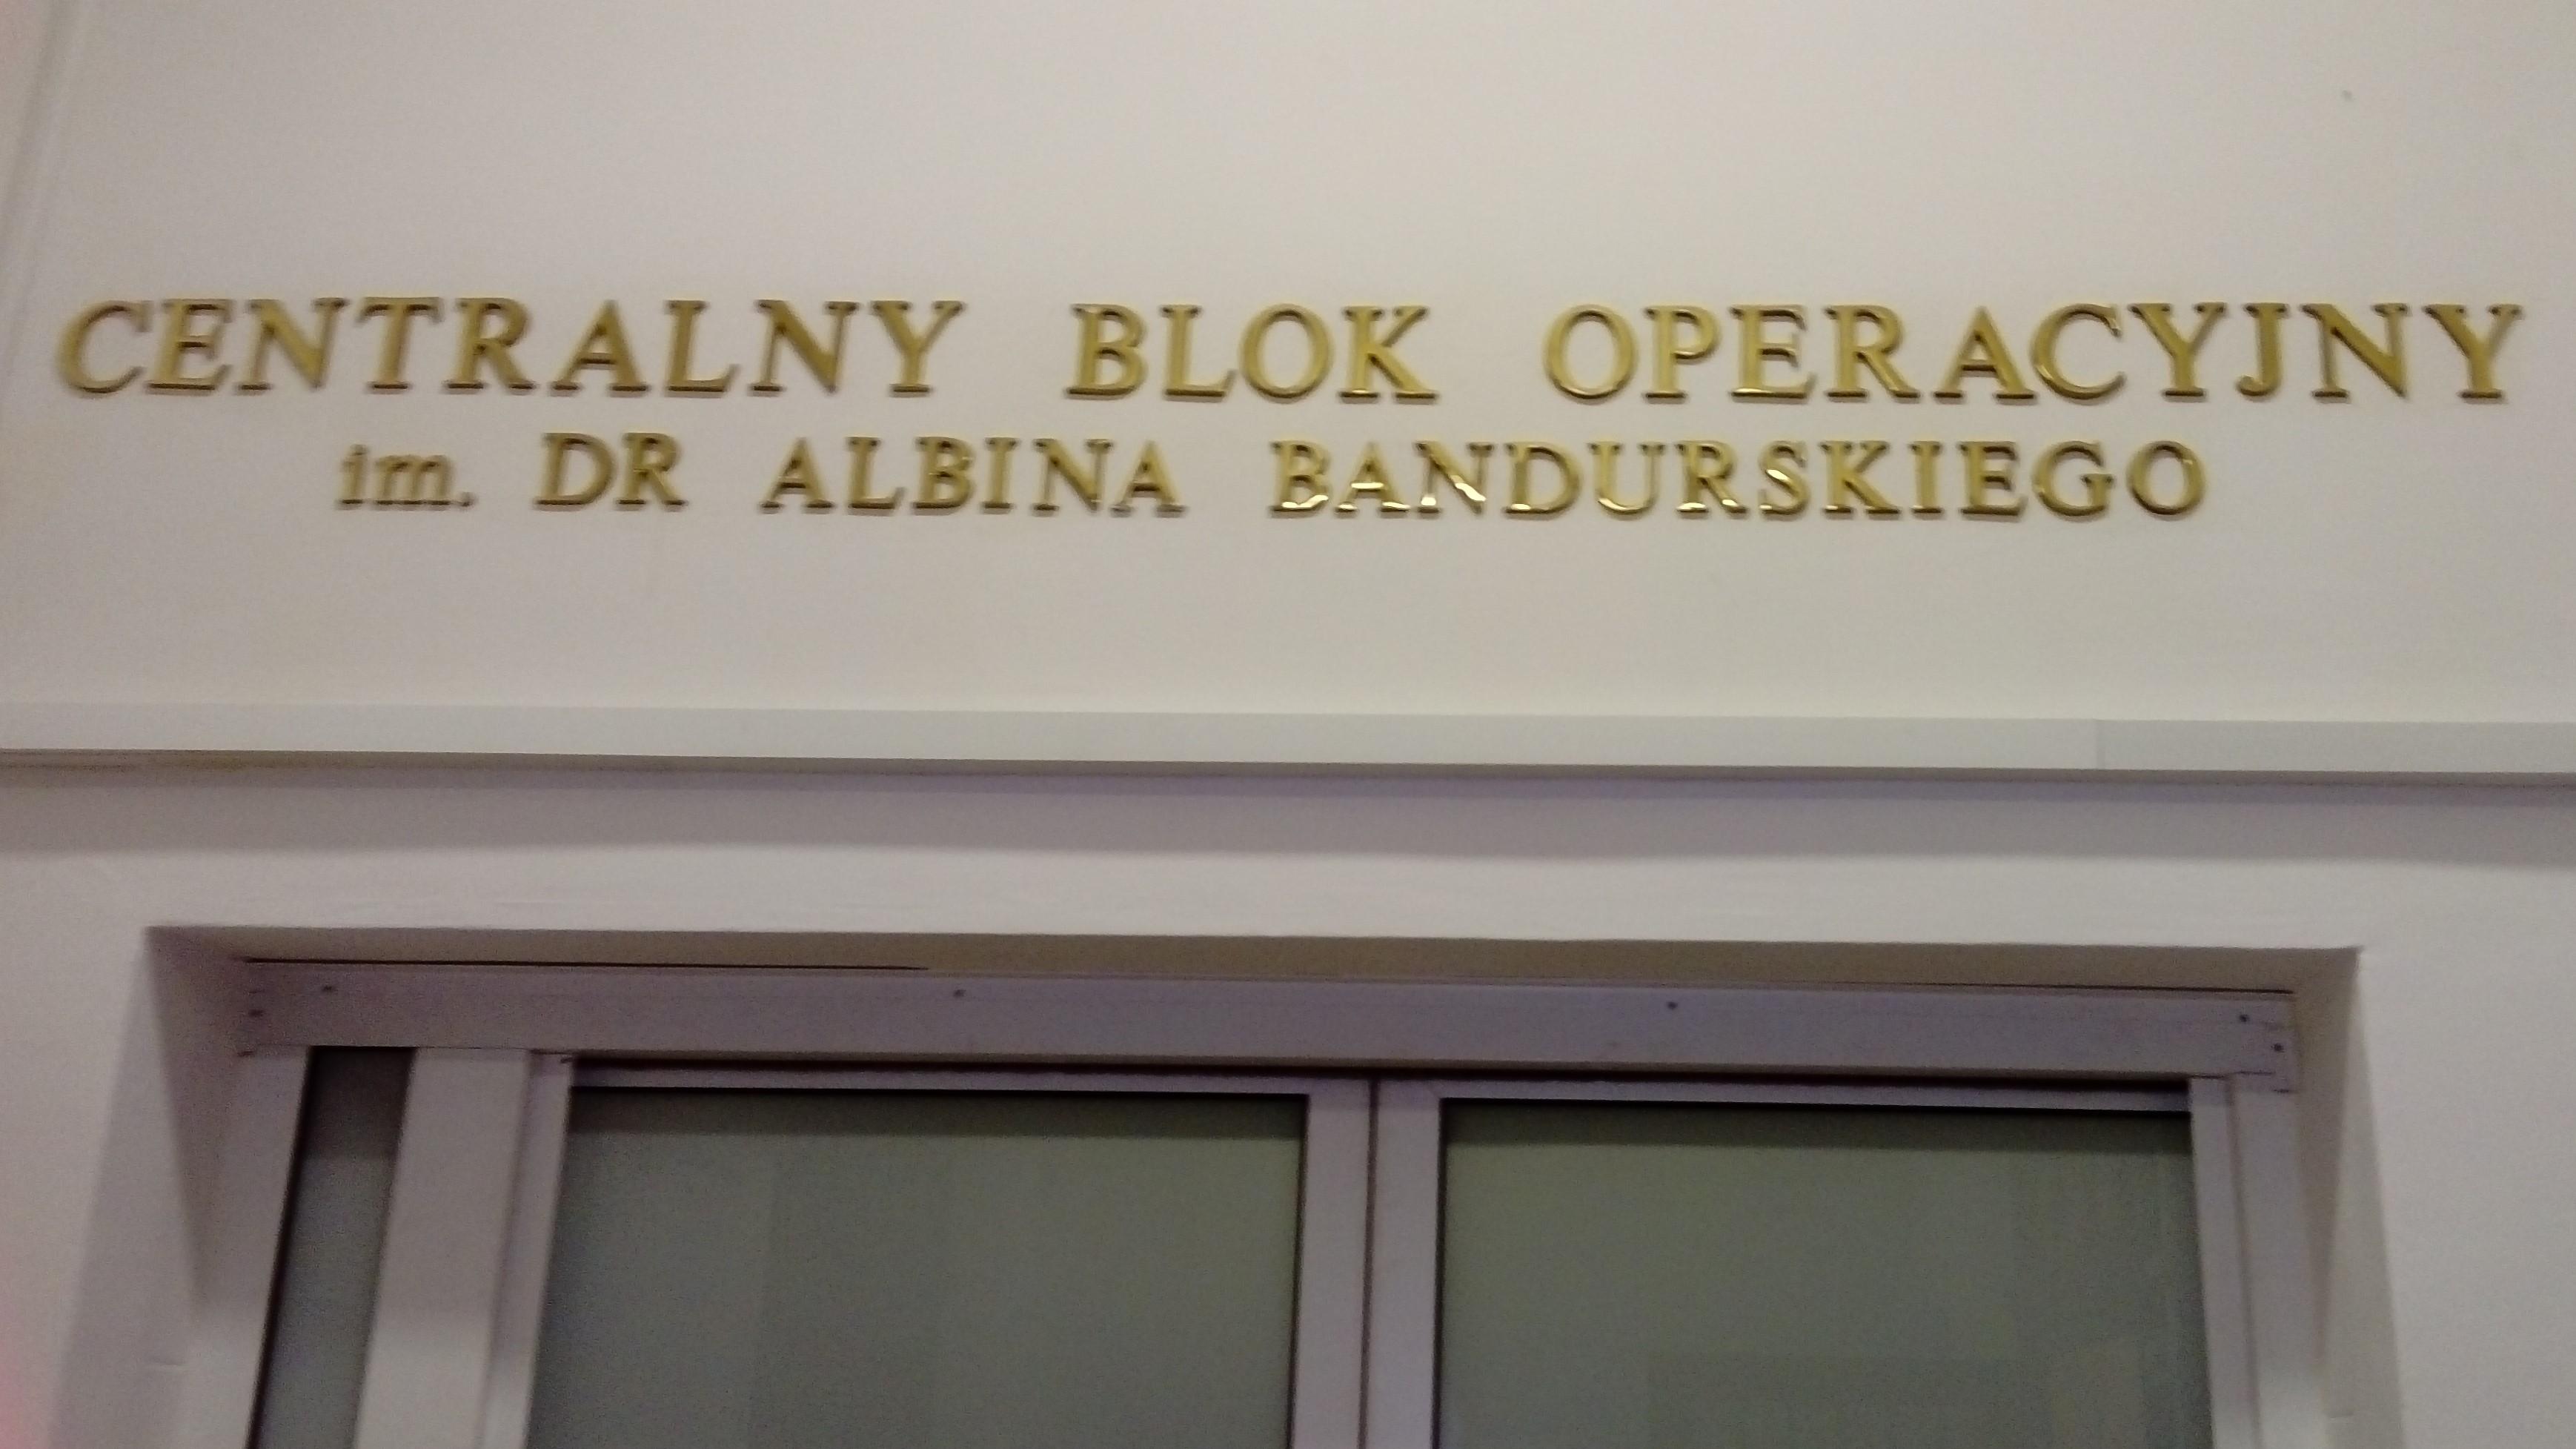 celntralny blok operacyjny  (2)